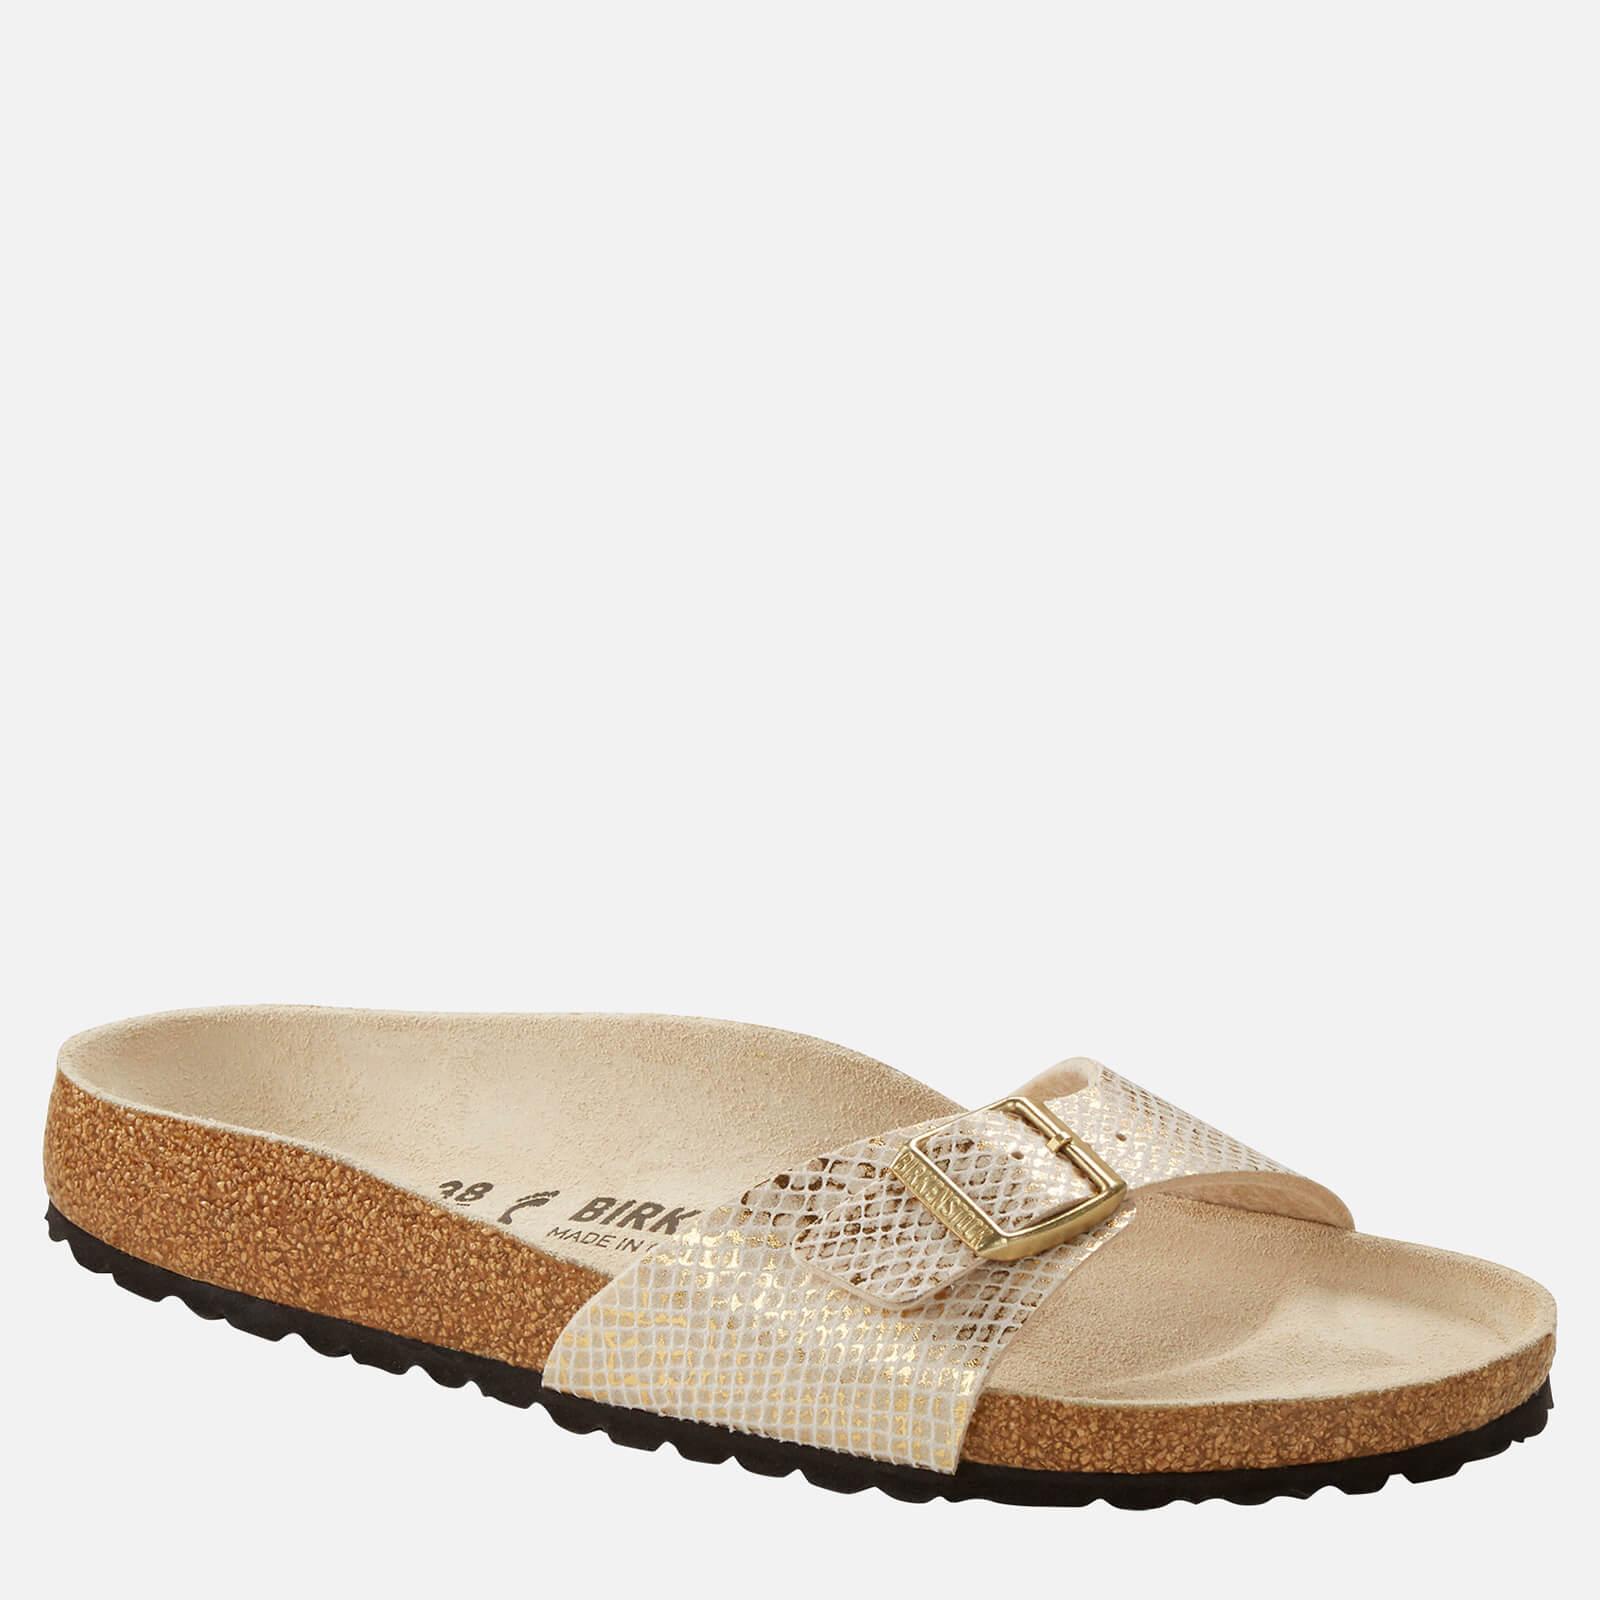 Birkenstock Womens Shiny Python Madrid Single Strap Sandals Eggshell Gold Eu 42 Uk 8